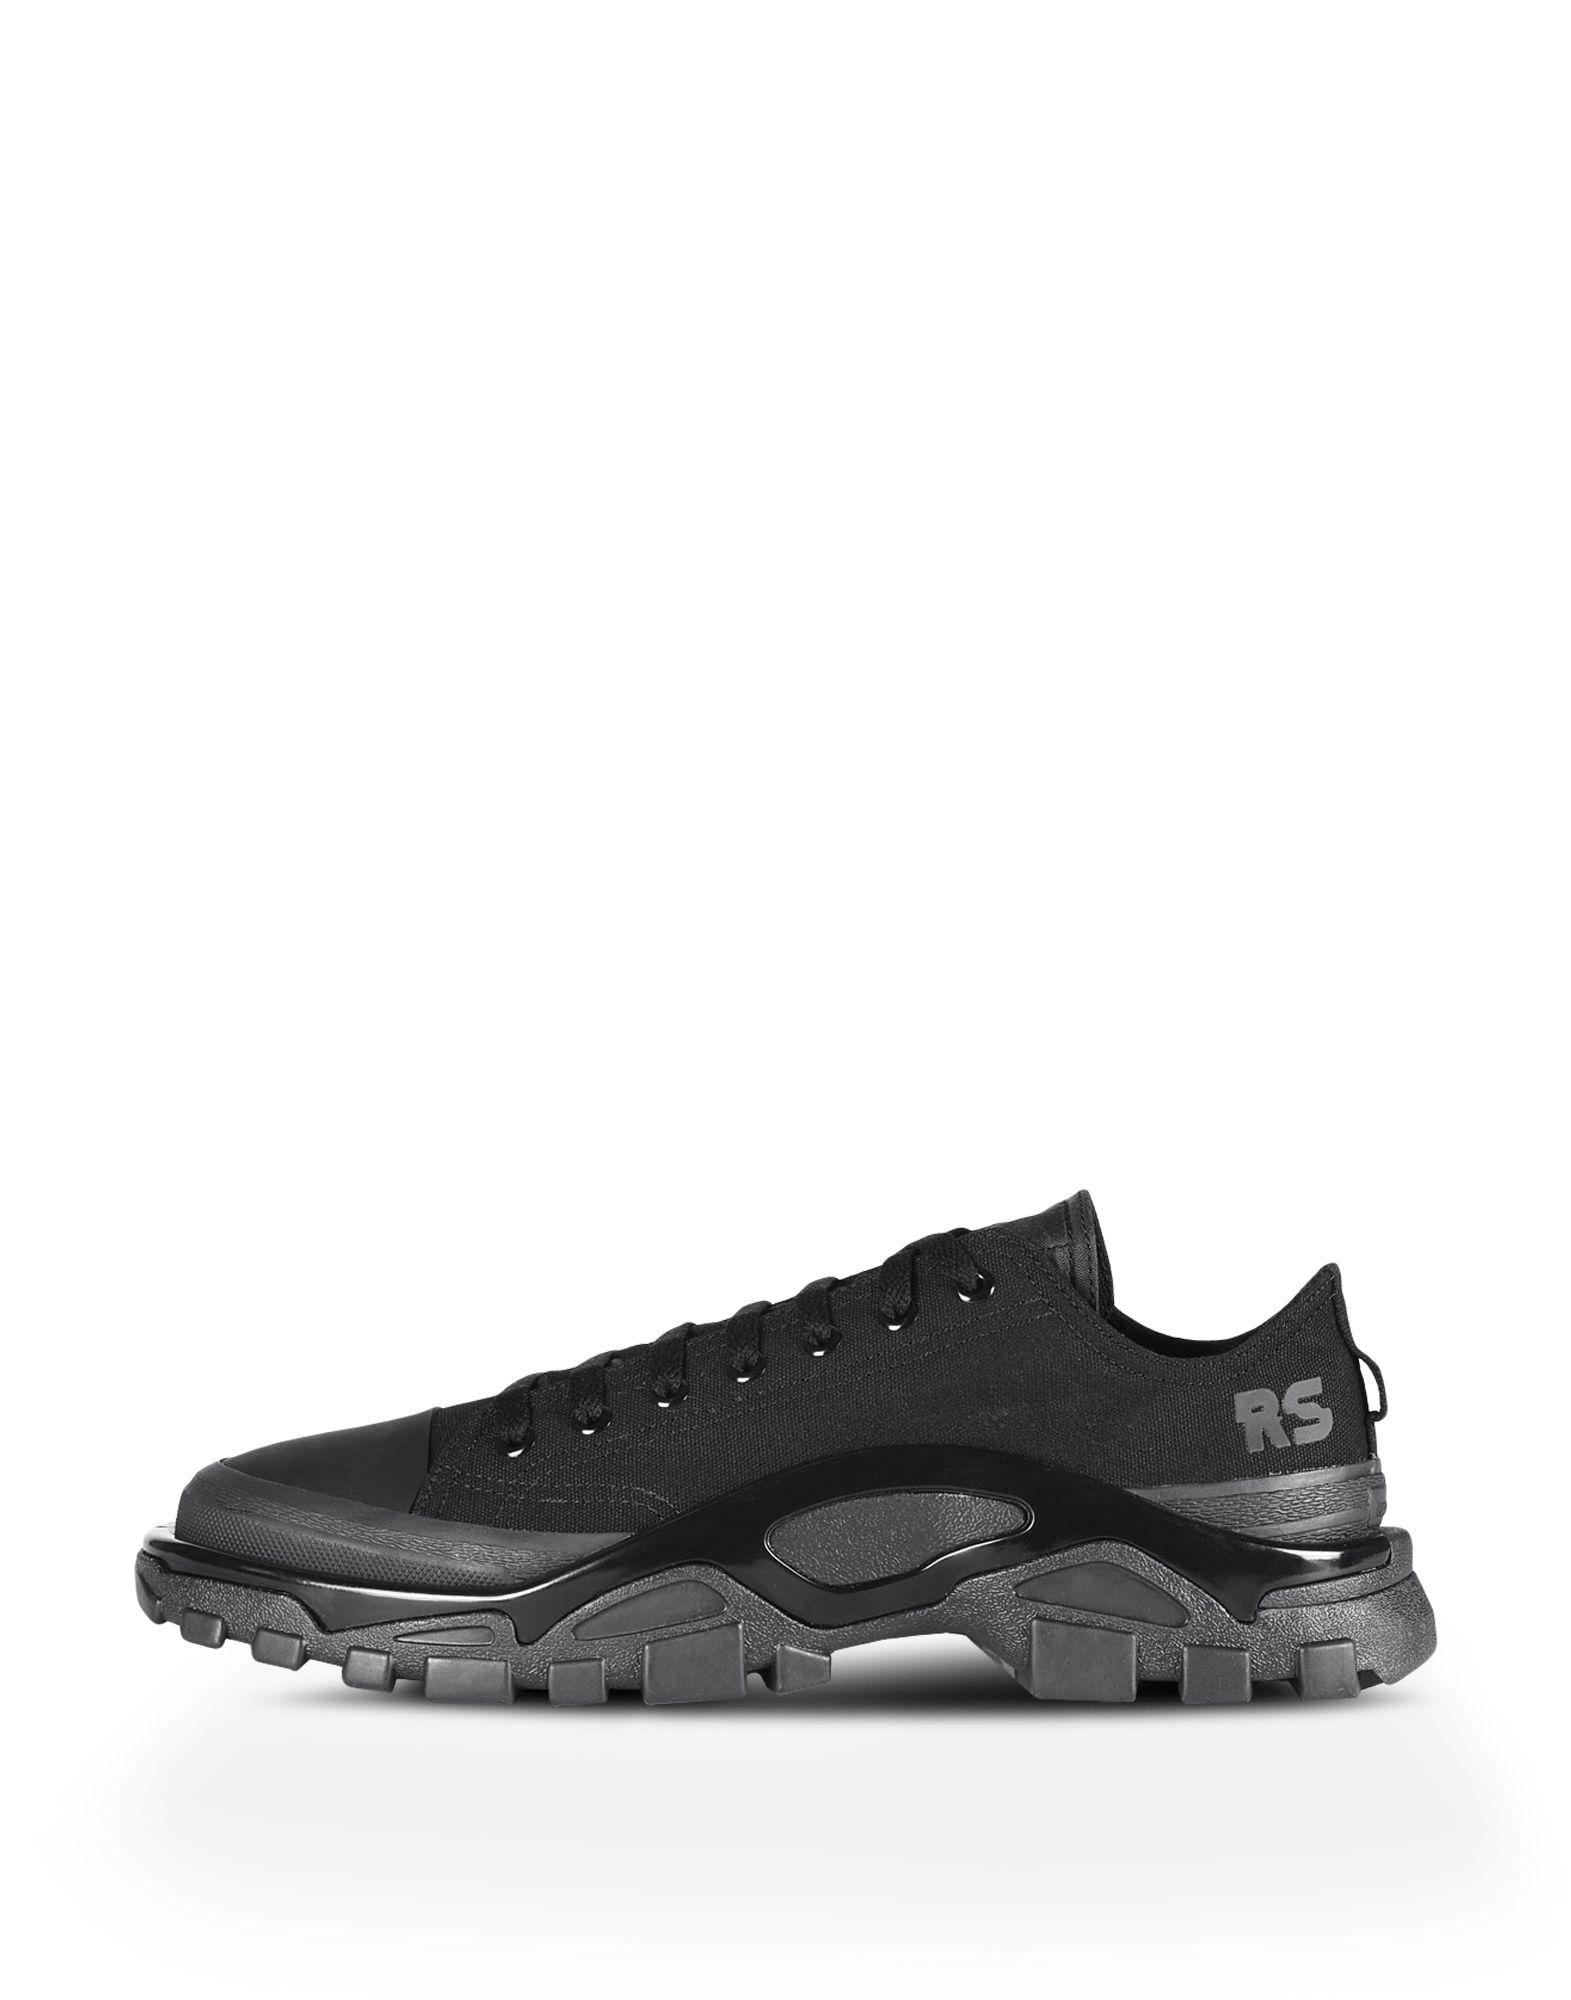 11fd54cf6347 ... ADIDAS by RAF SIMONS RS DETROIT RUNNER Sneakers Man ...